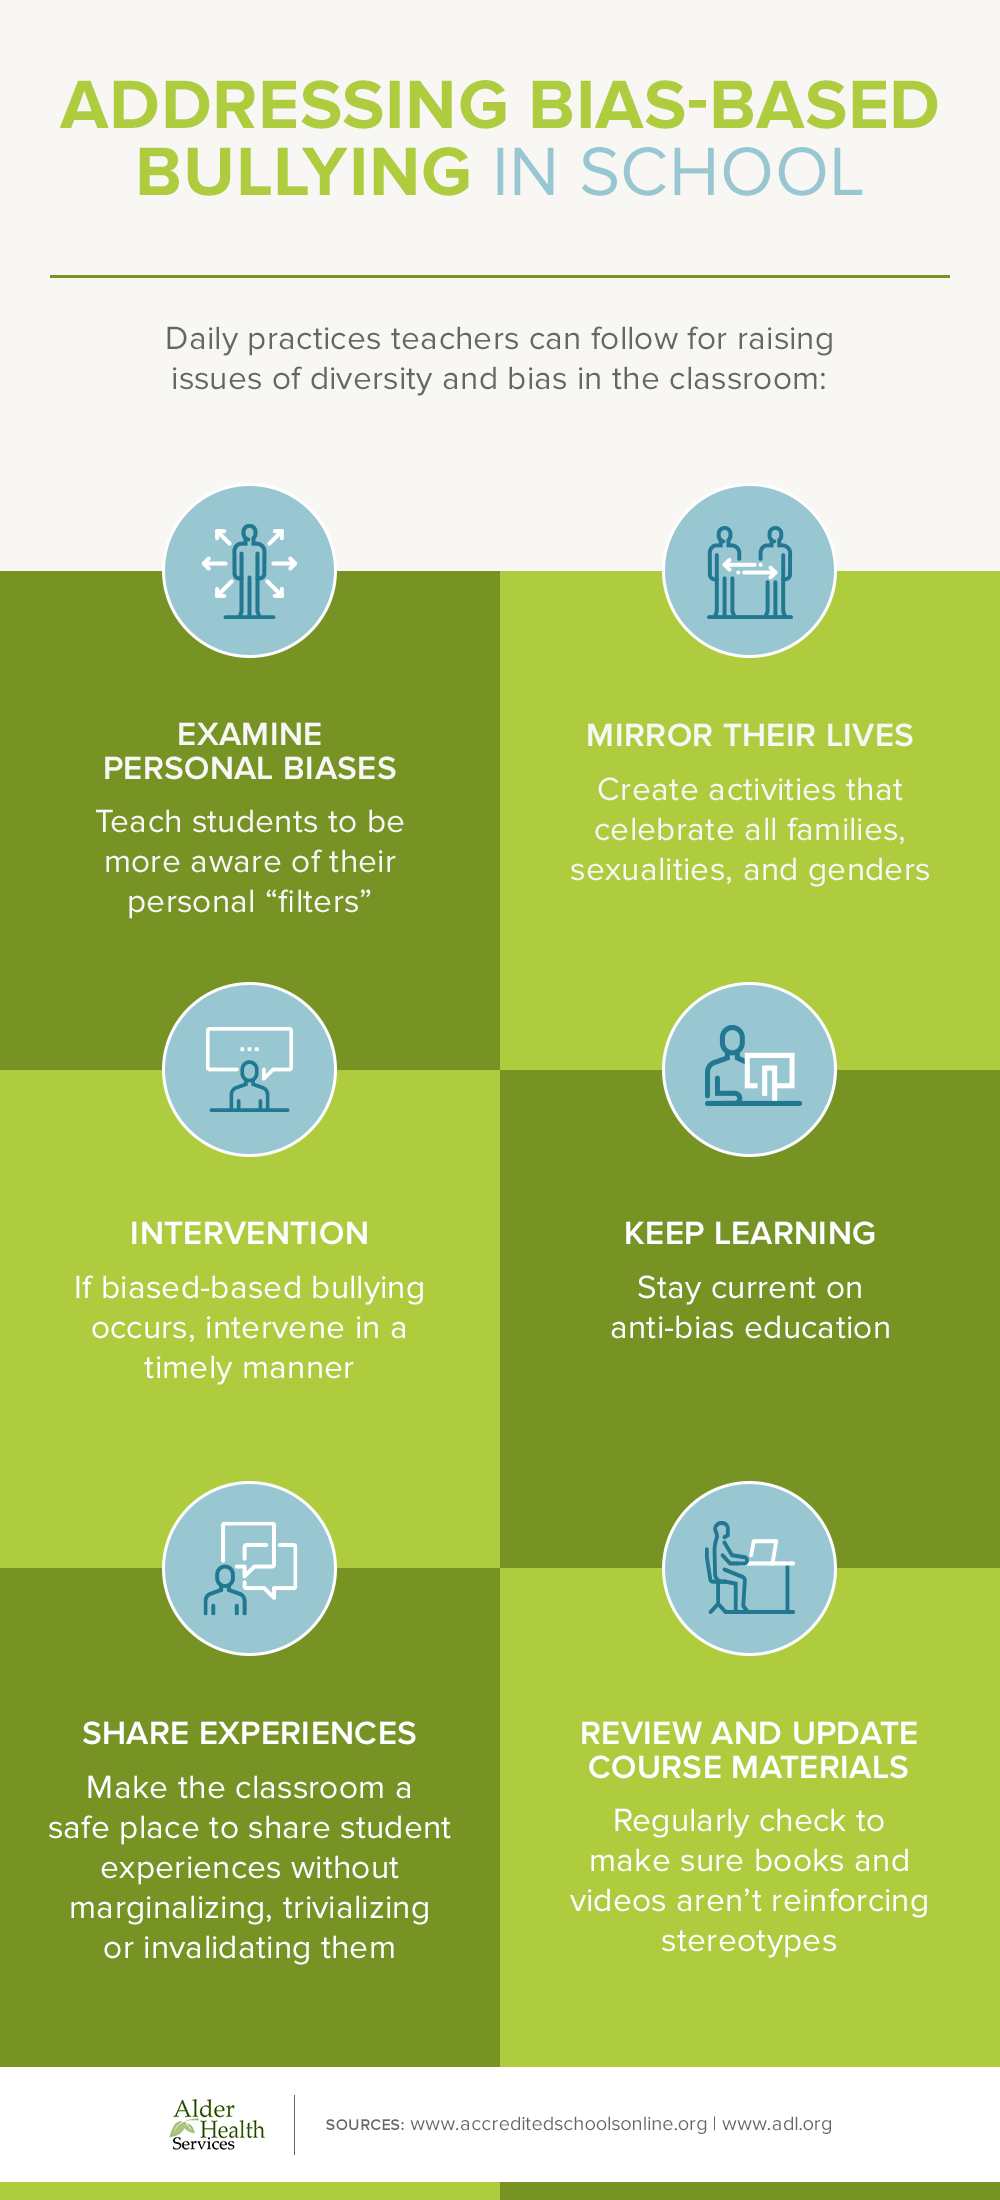 Steps to Address Bias-Based Bullying in School